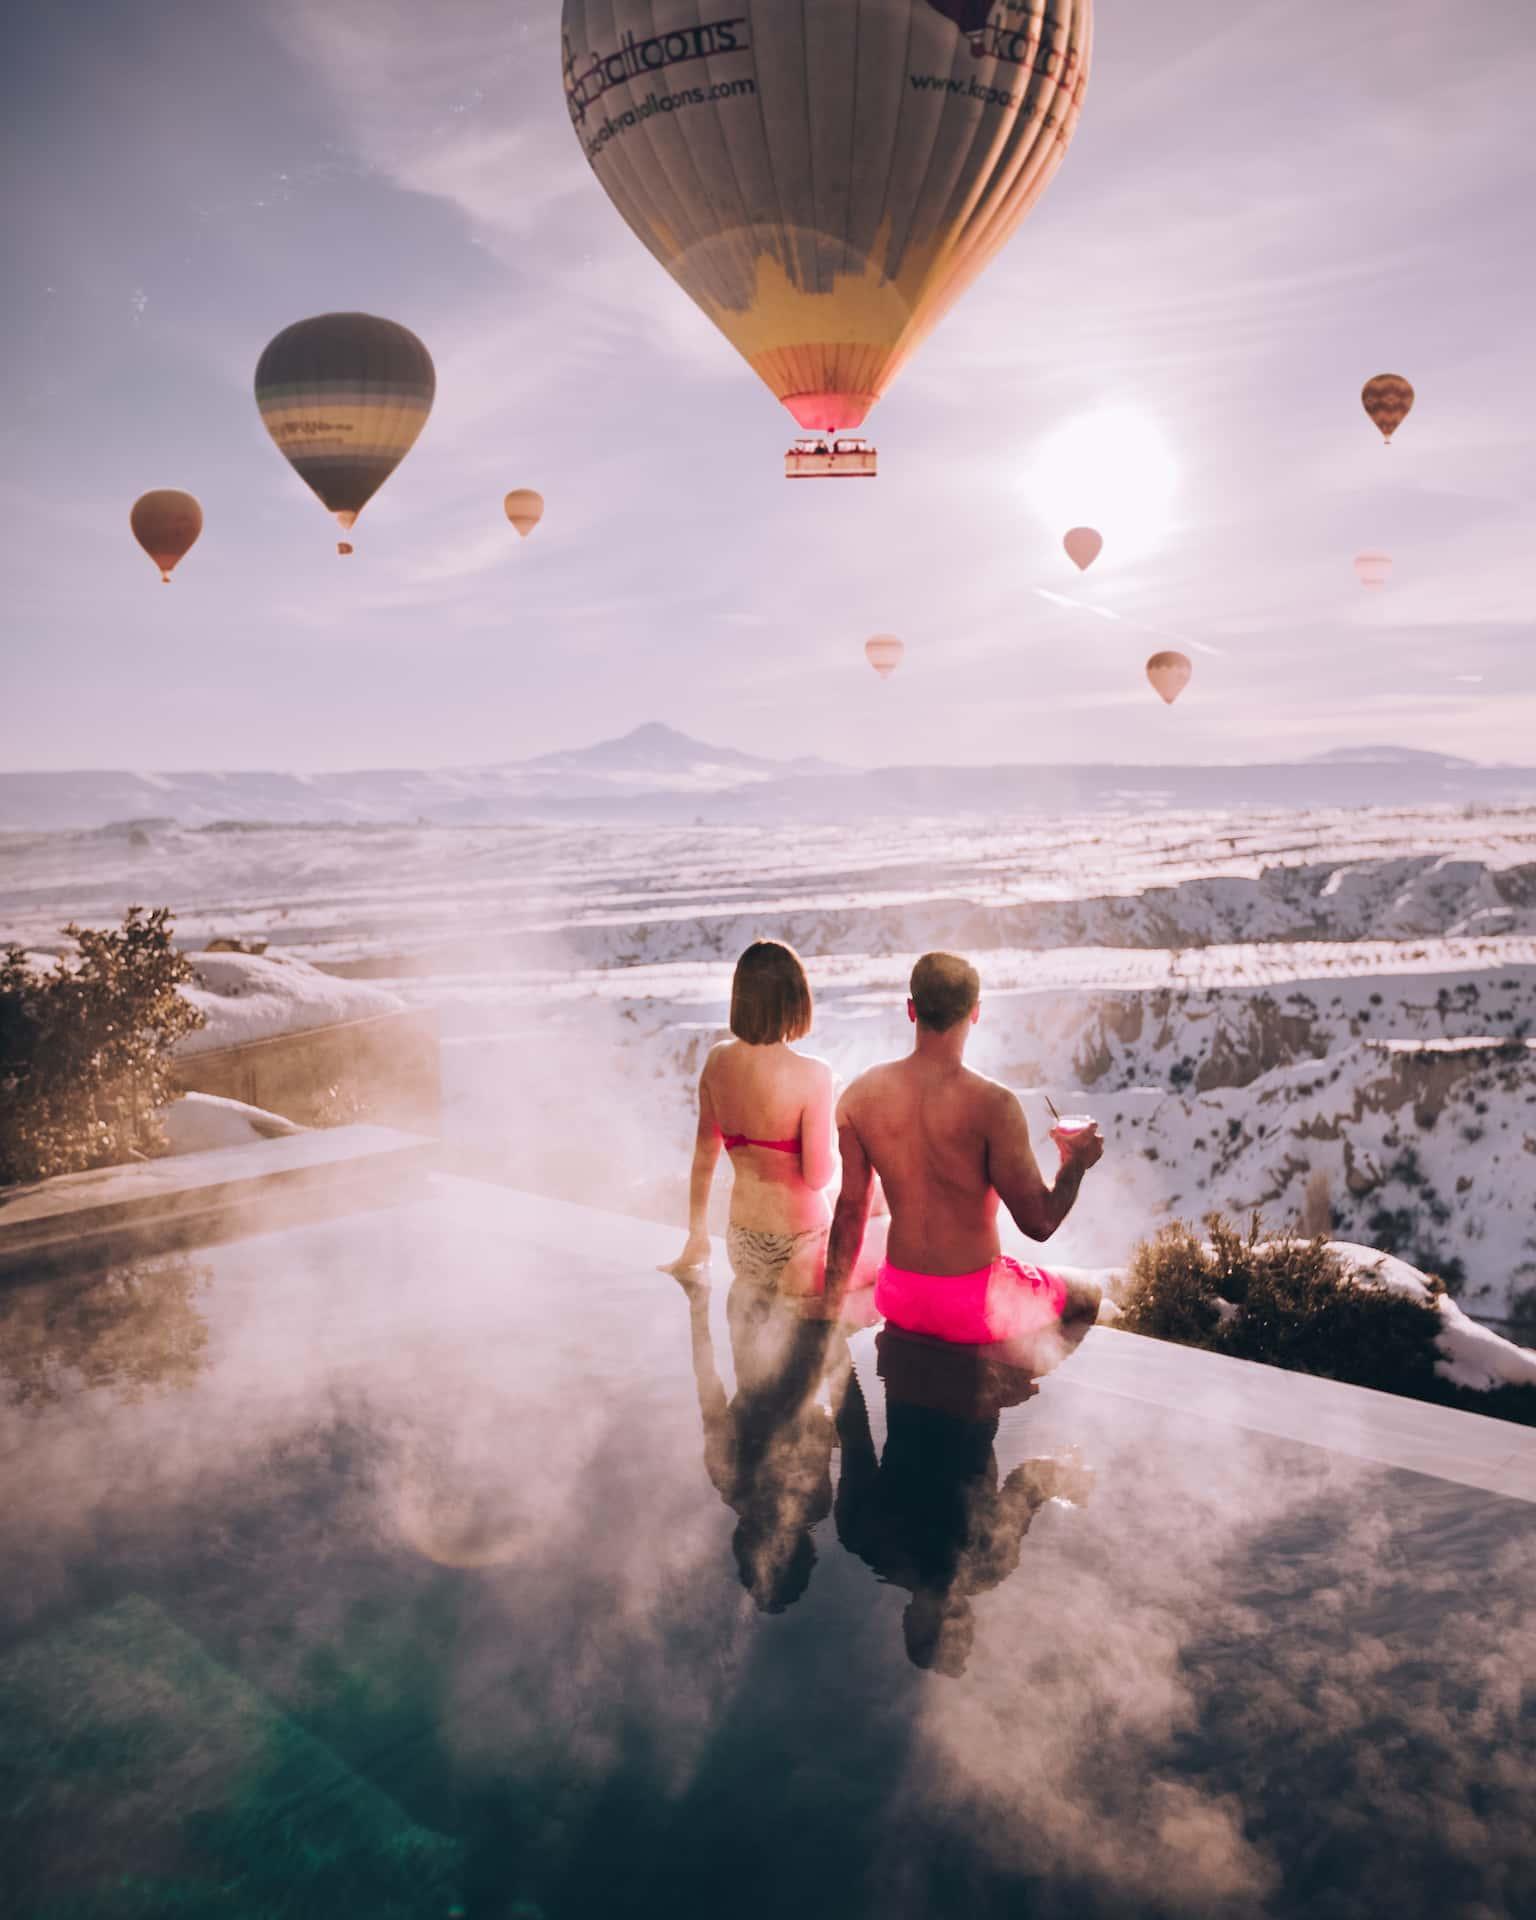 Воздушные шары Argos in Cappadocia, фото